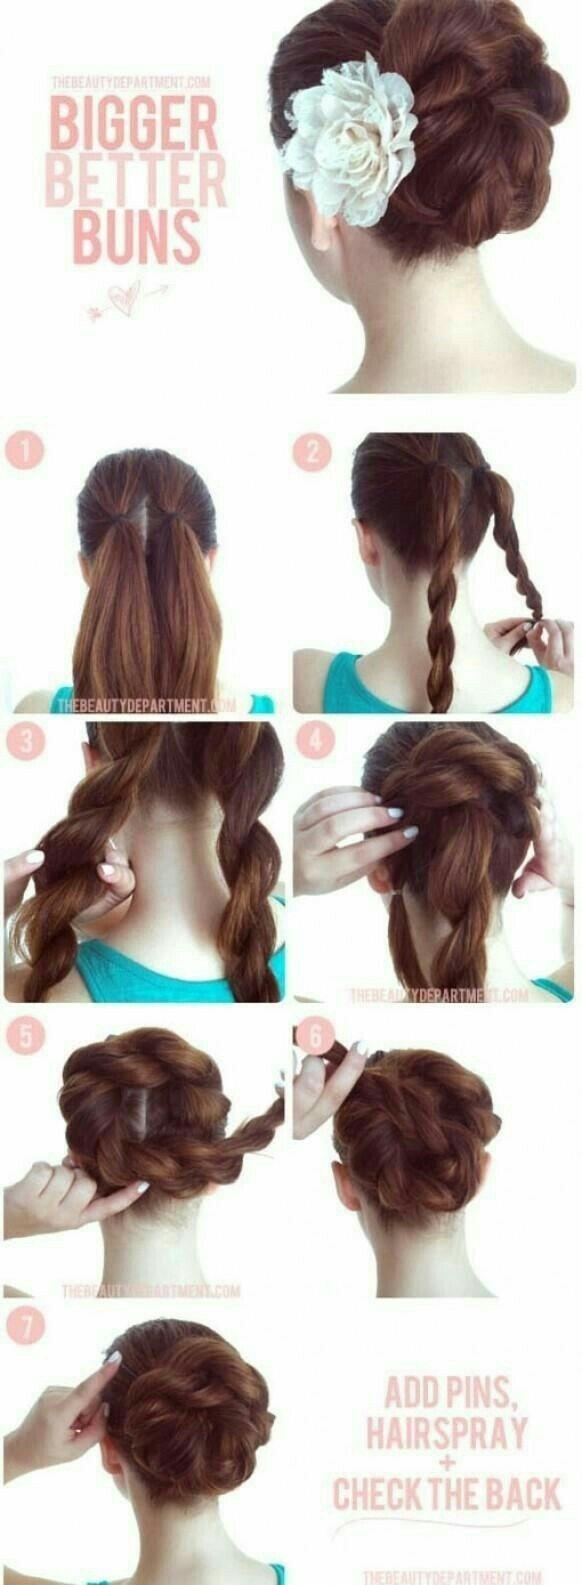 easy bun tutorial .................................... #hairideas #hairstyles #haircuts #hairlavie #hairinspo #hairinspiration #hair #hairlavie #hairtutorial #hairbuns